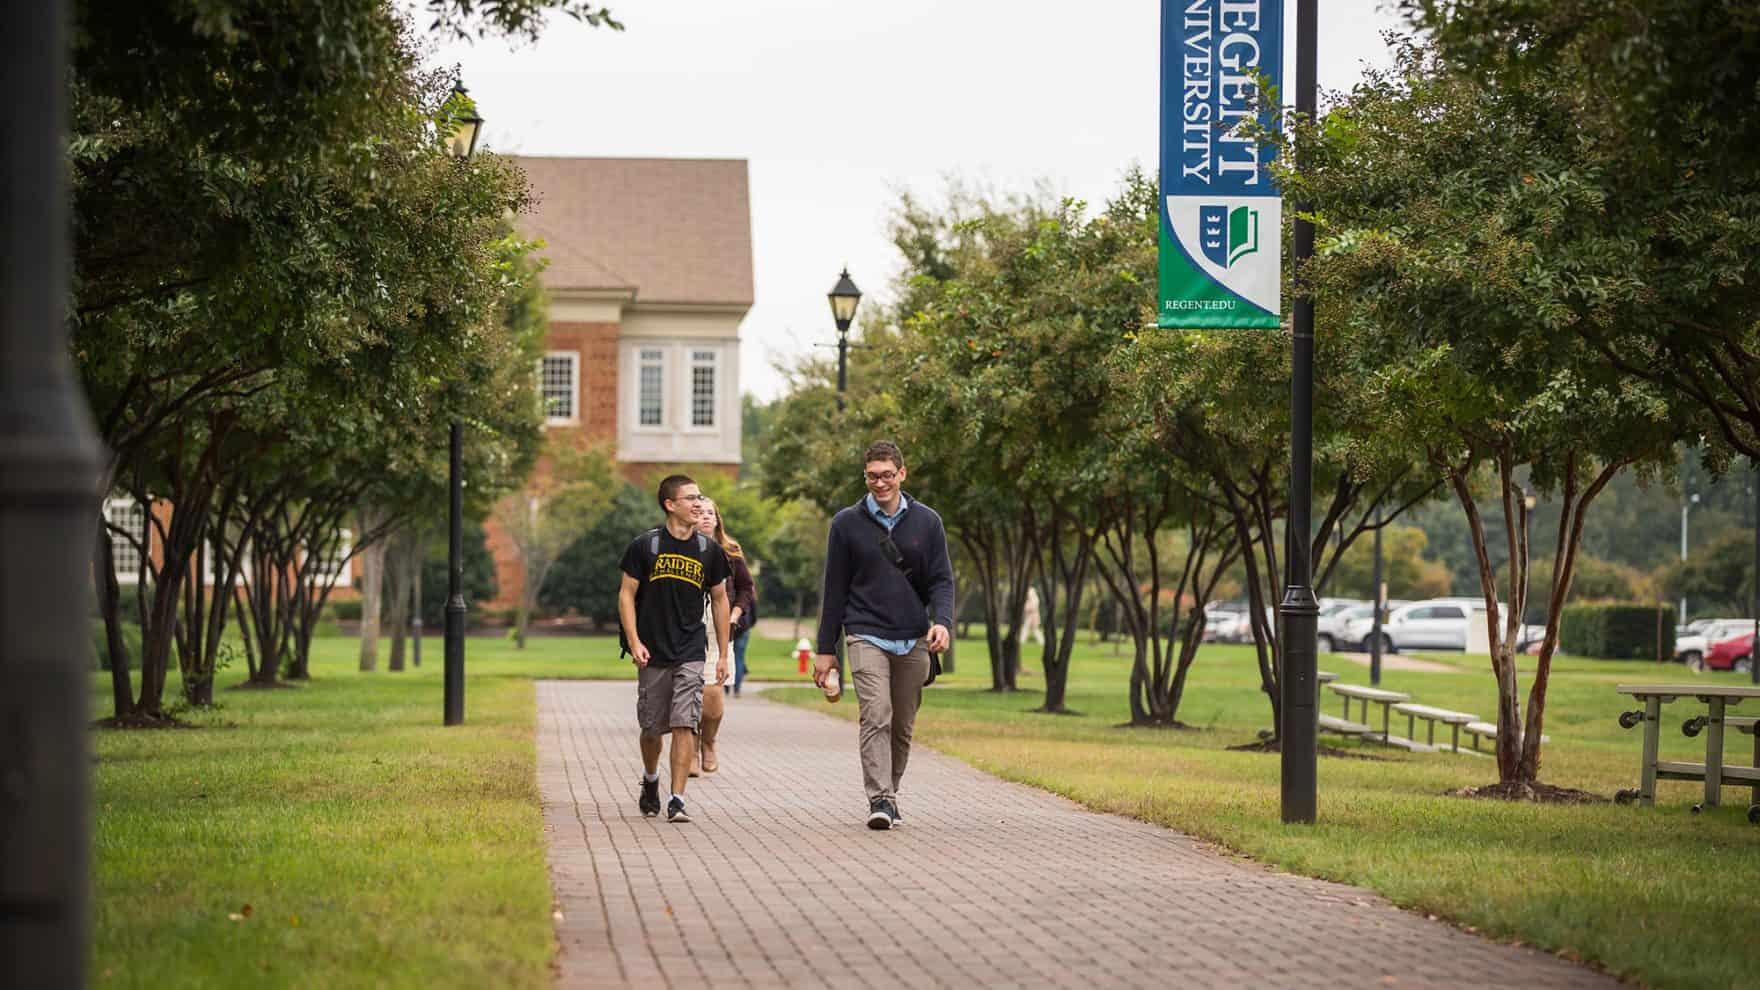 Students walk through Regent University, a Christian college in Virginia Beach.